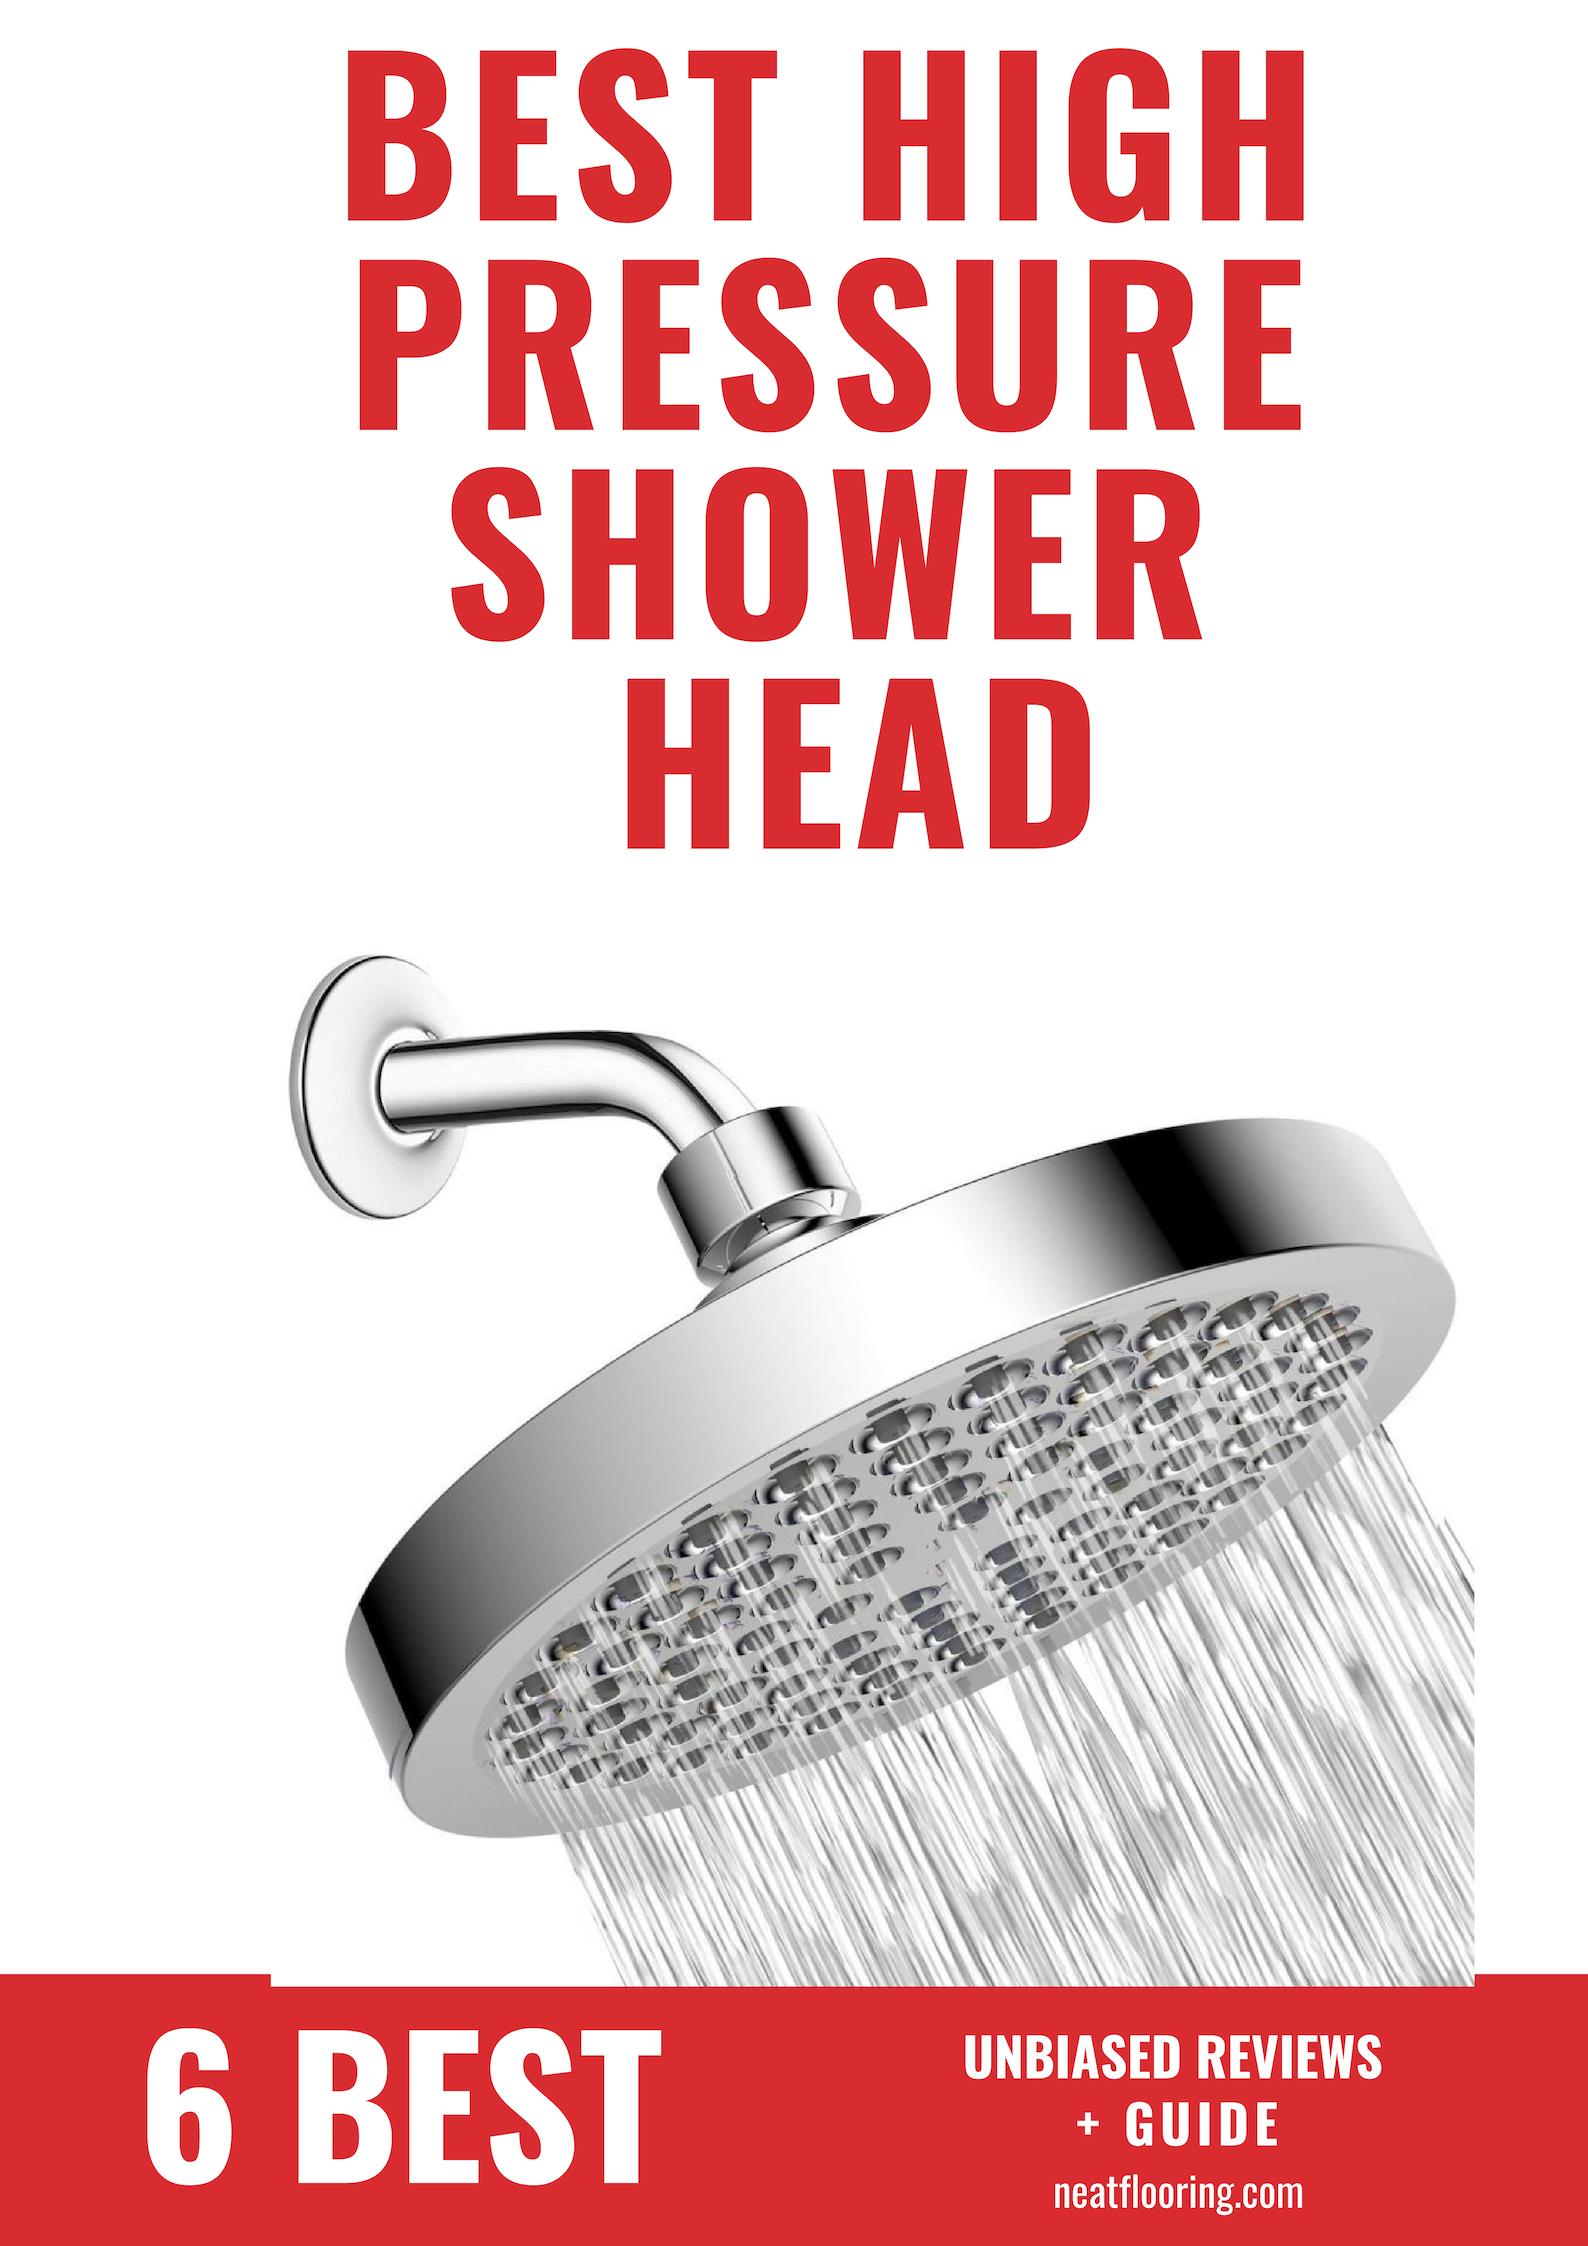 Best High Pressure Shower Head High Pressure Shower Head Shower Head Reviews Shower Heads